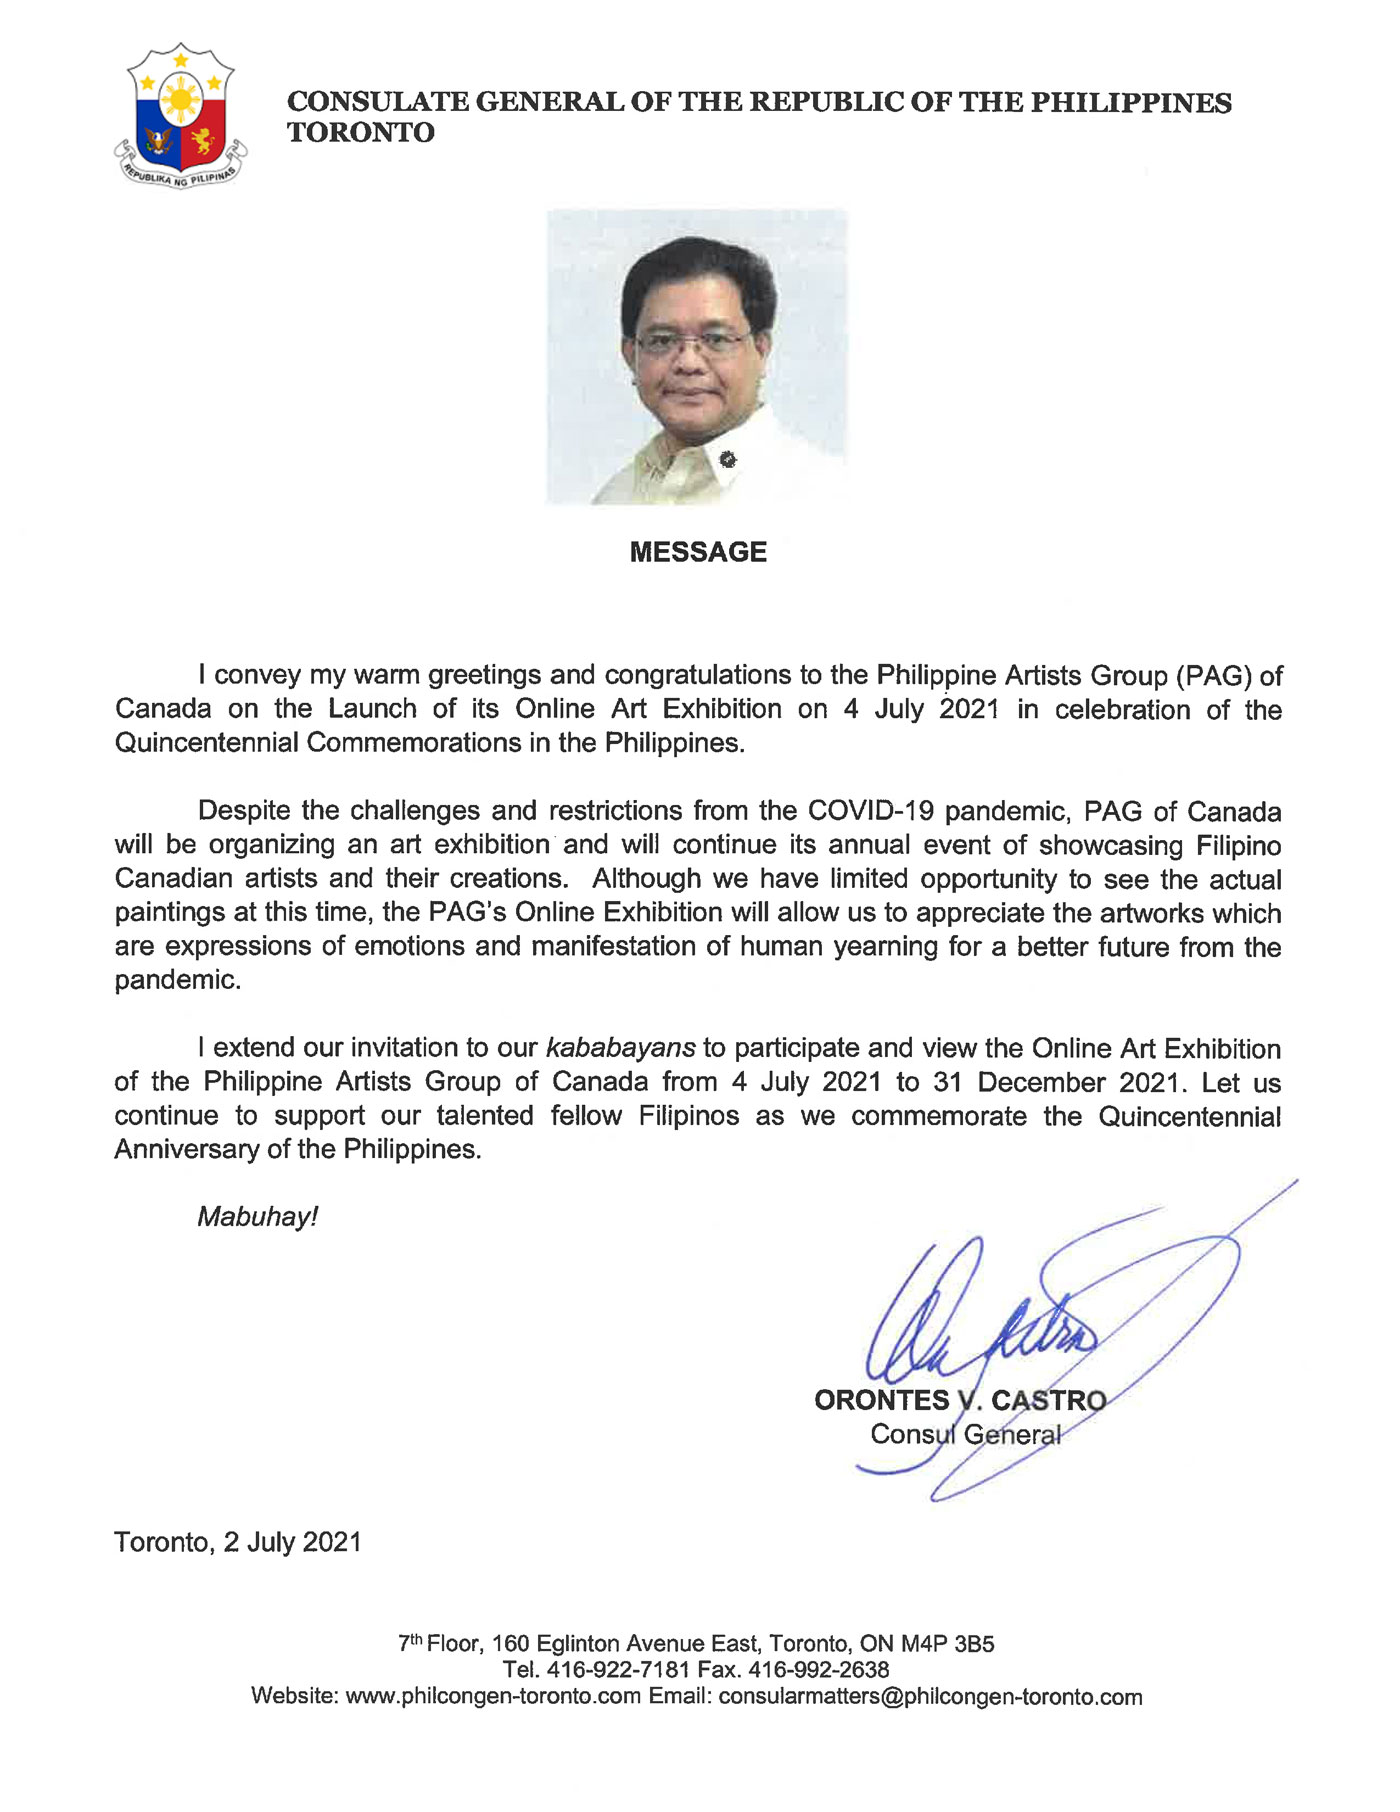 Consul General Orontes Castro Message to PAG